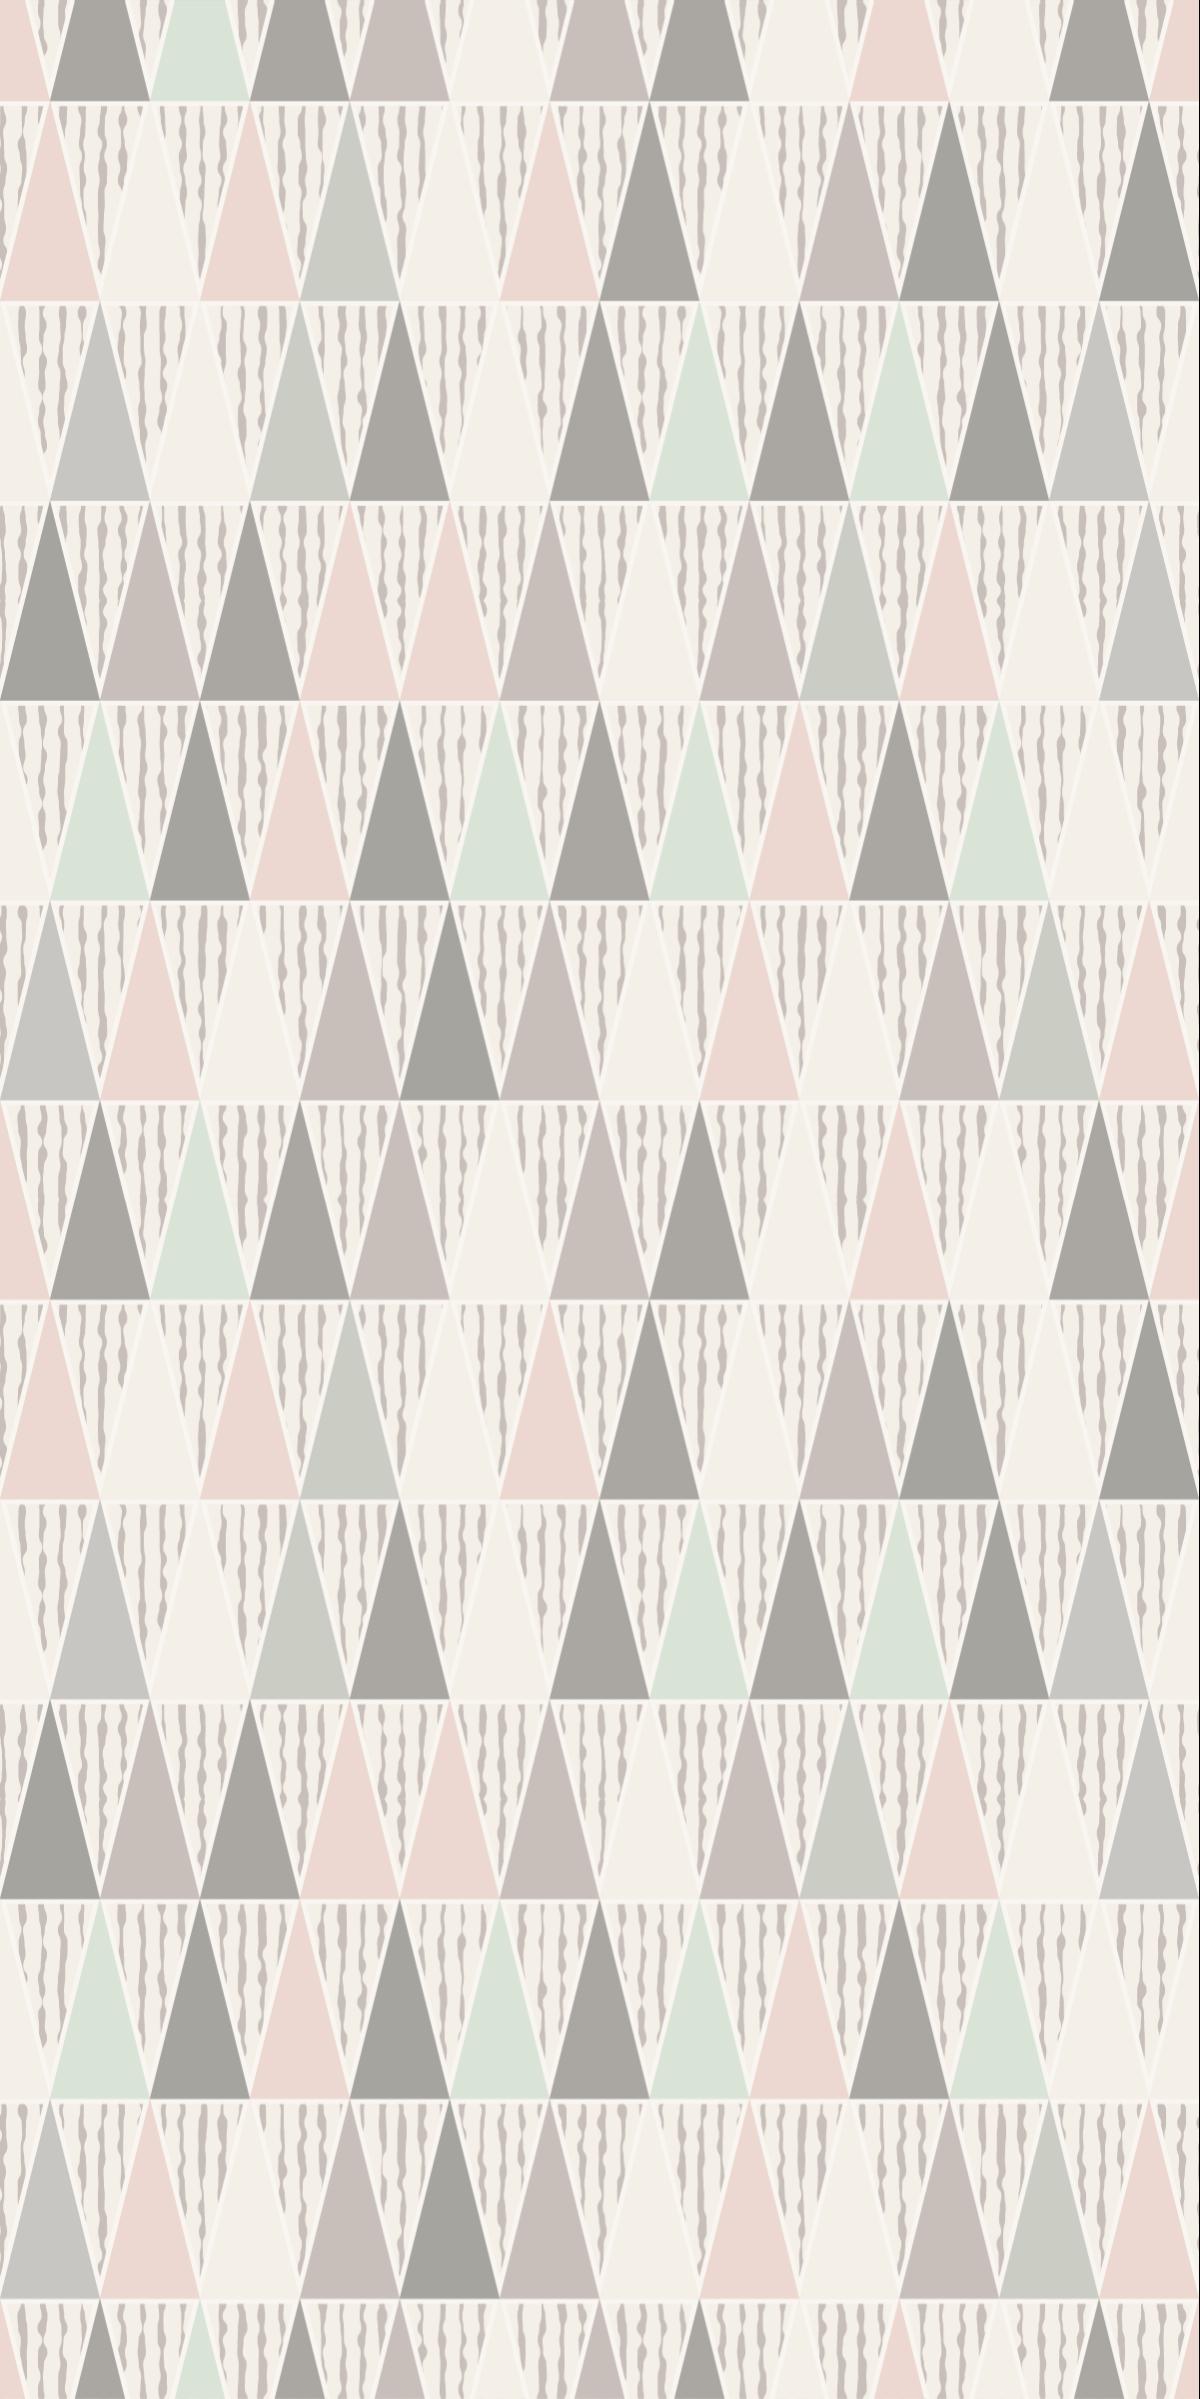 TenStickers. 原始的北欧风格与颜色北欧风格的地毯. 这种带有彩色乙烯基地毯的北欧风格非常适合装饰您的托儿所或幼儿园!它提供许多北欧色彩,而且美丽。